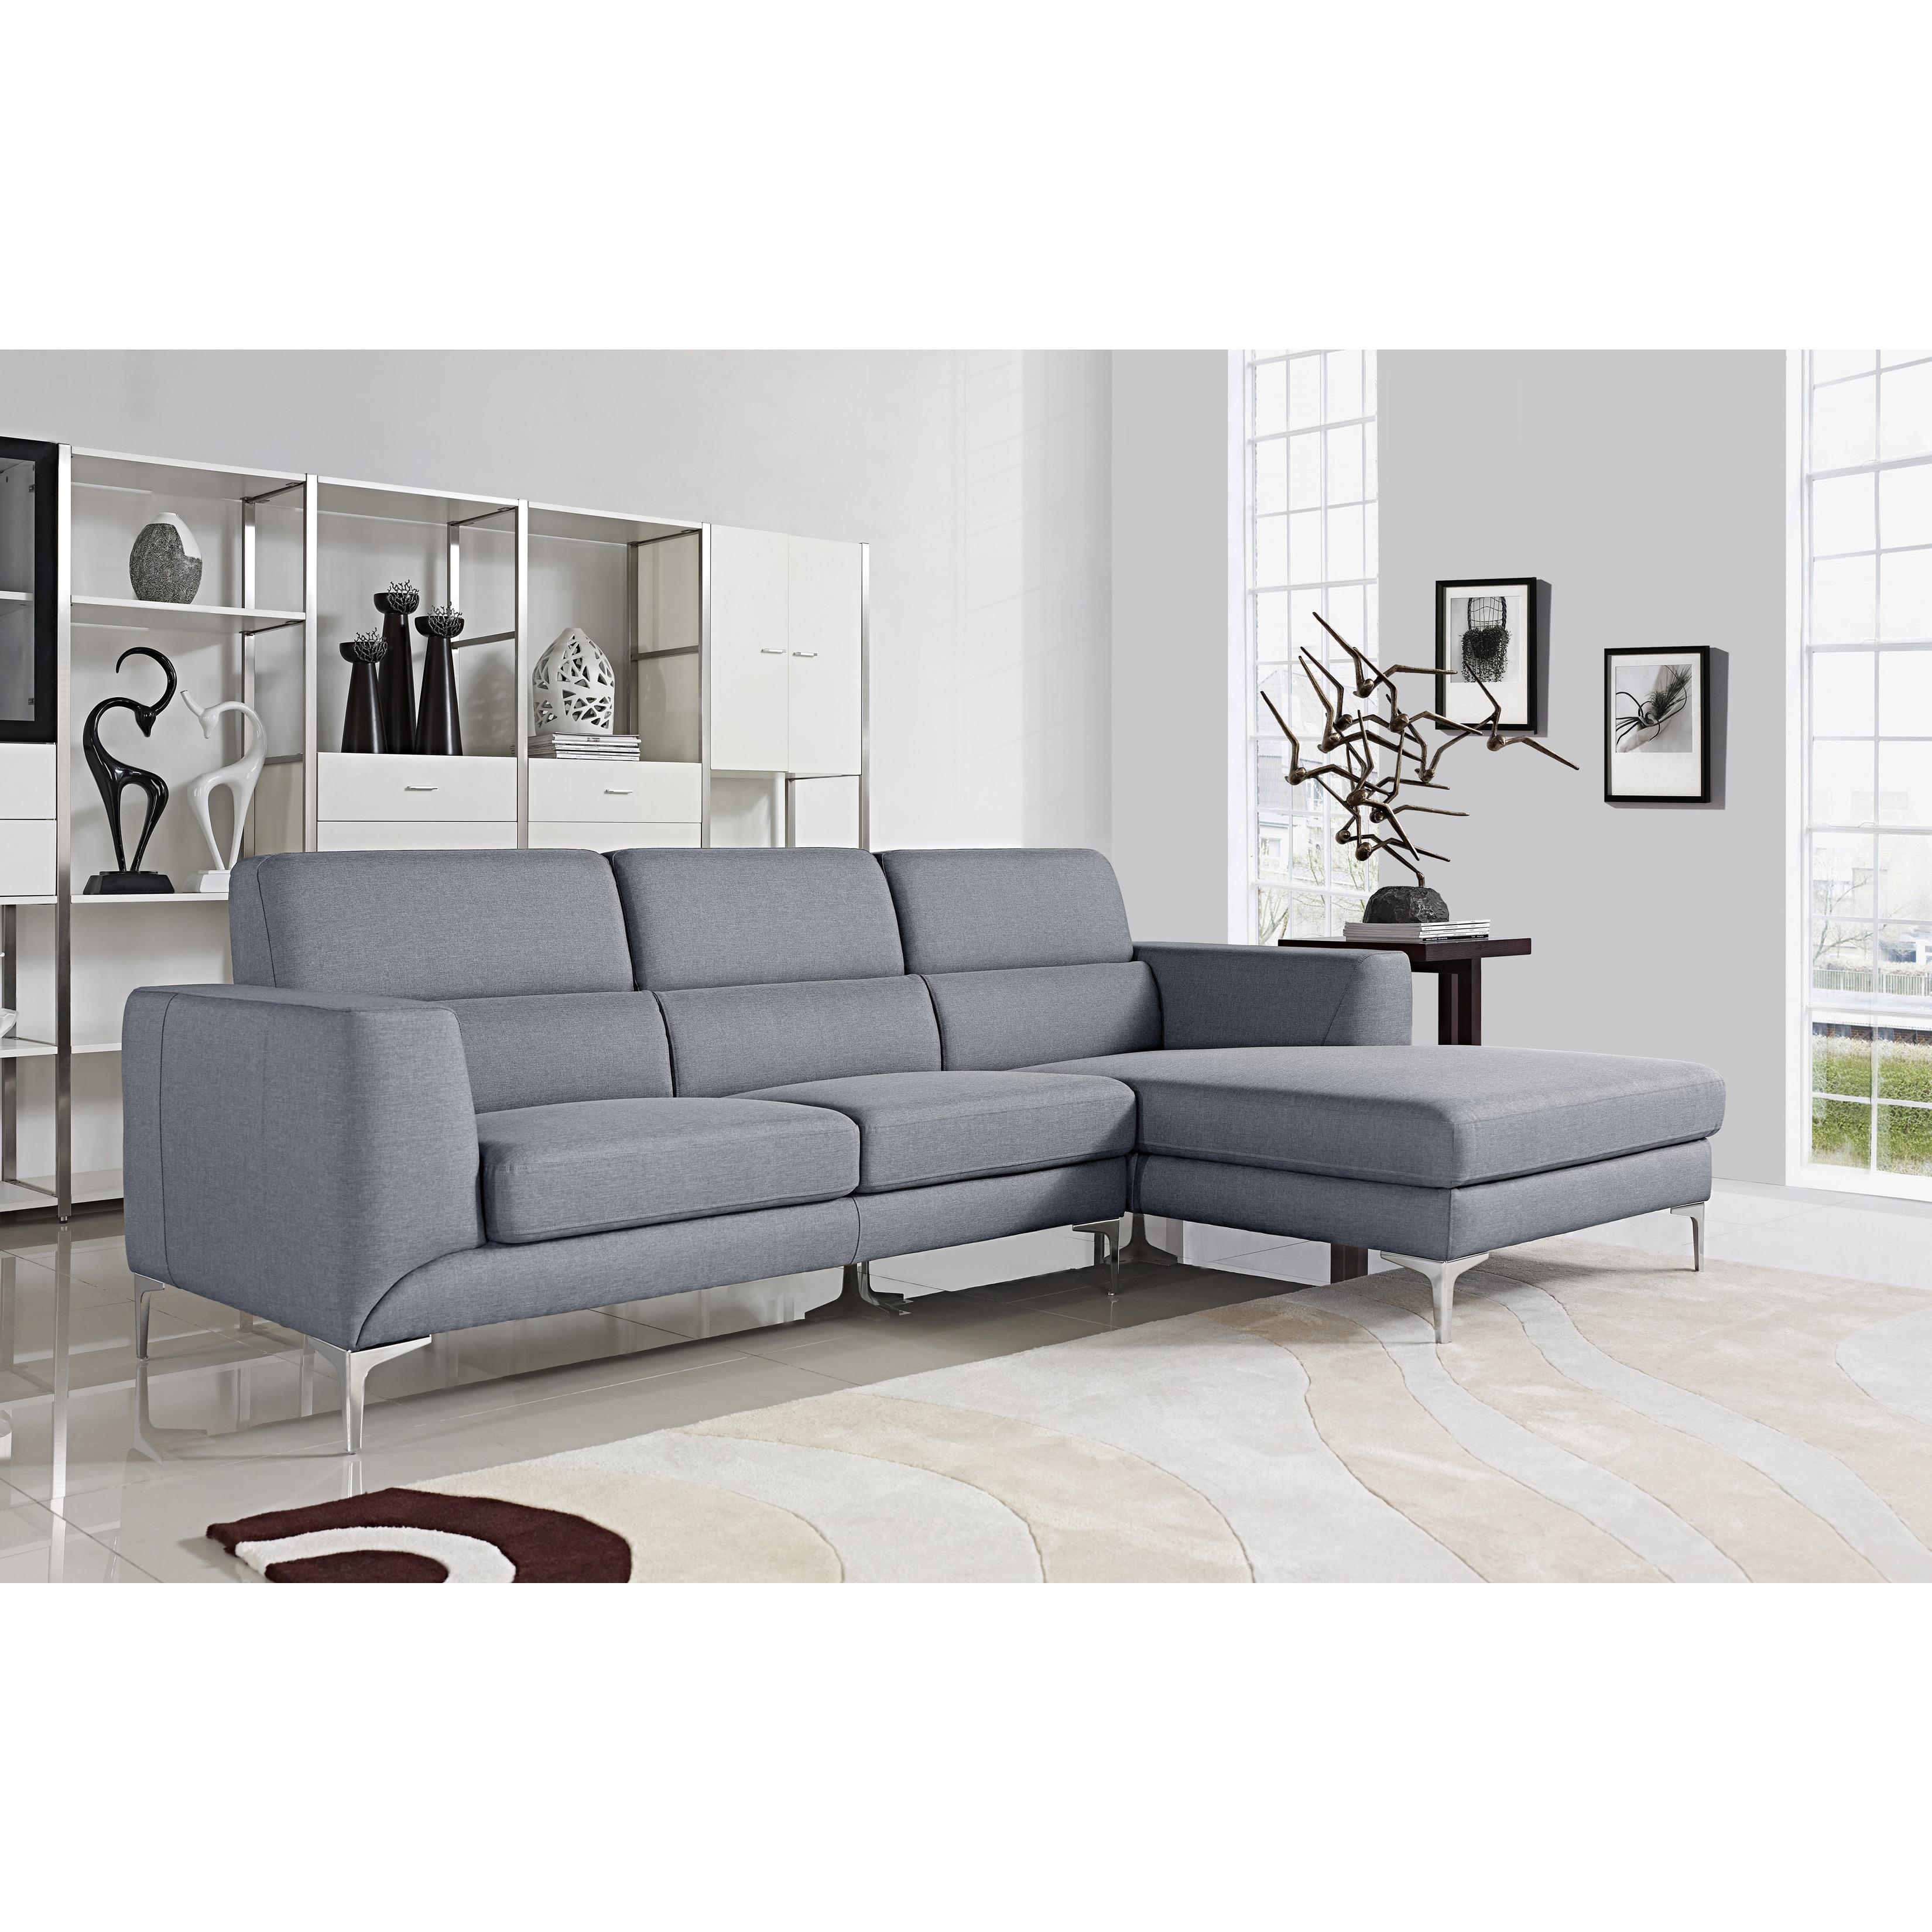 Modern Sectional Sofas Grey: Xena Light Grey Modern Sectional Sofa Set